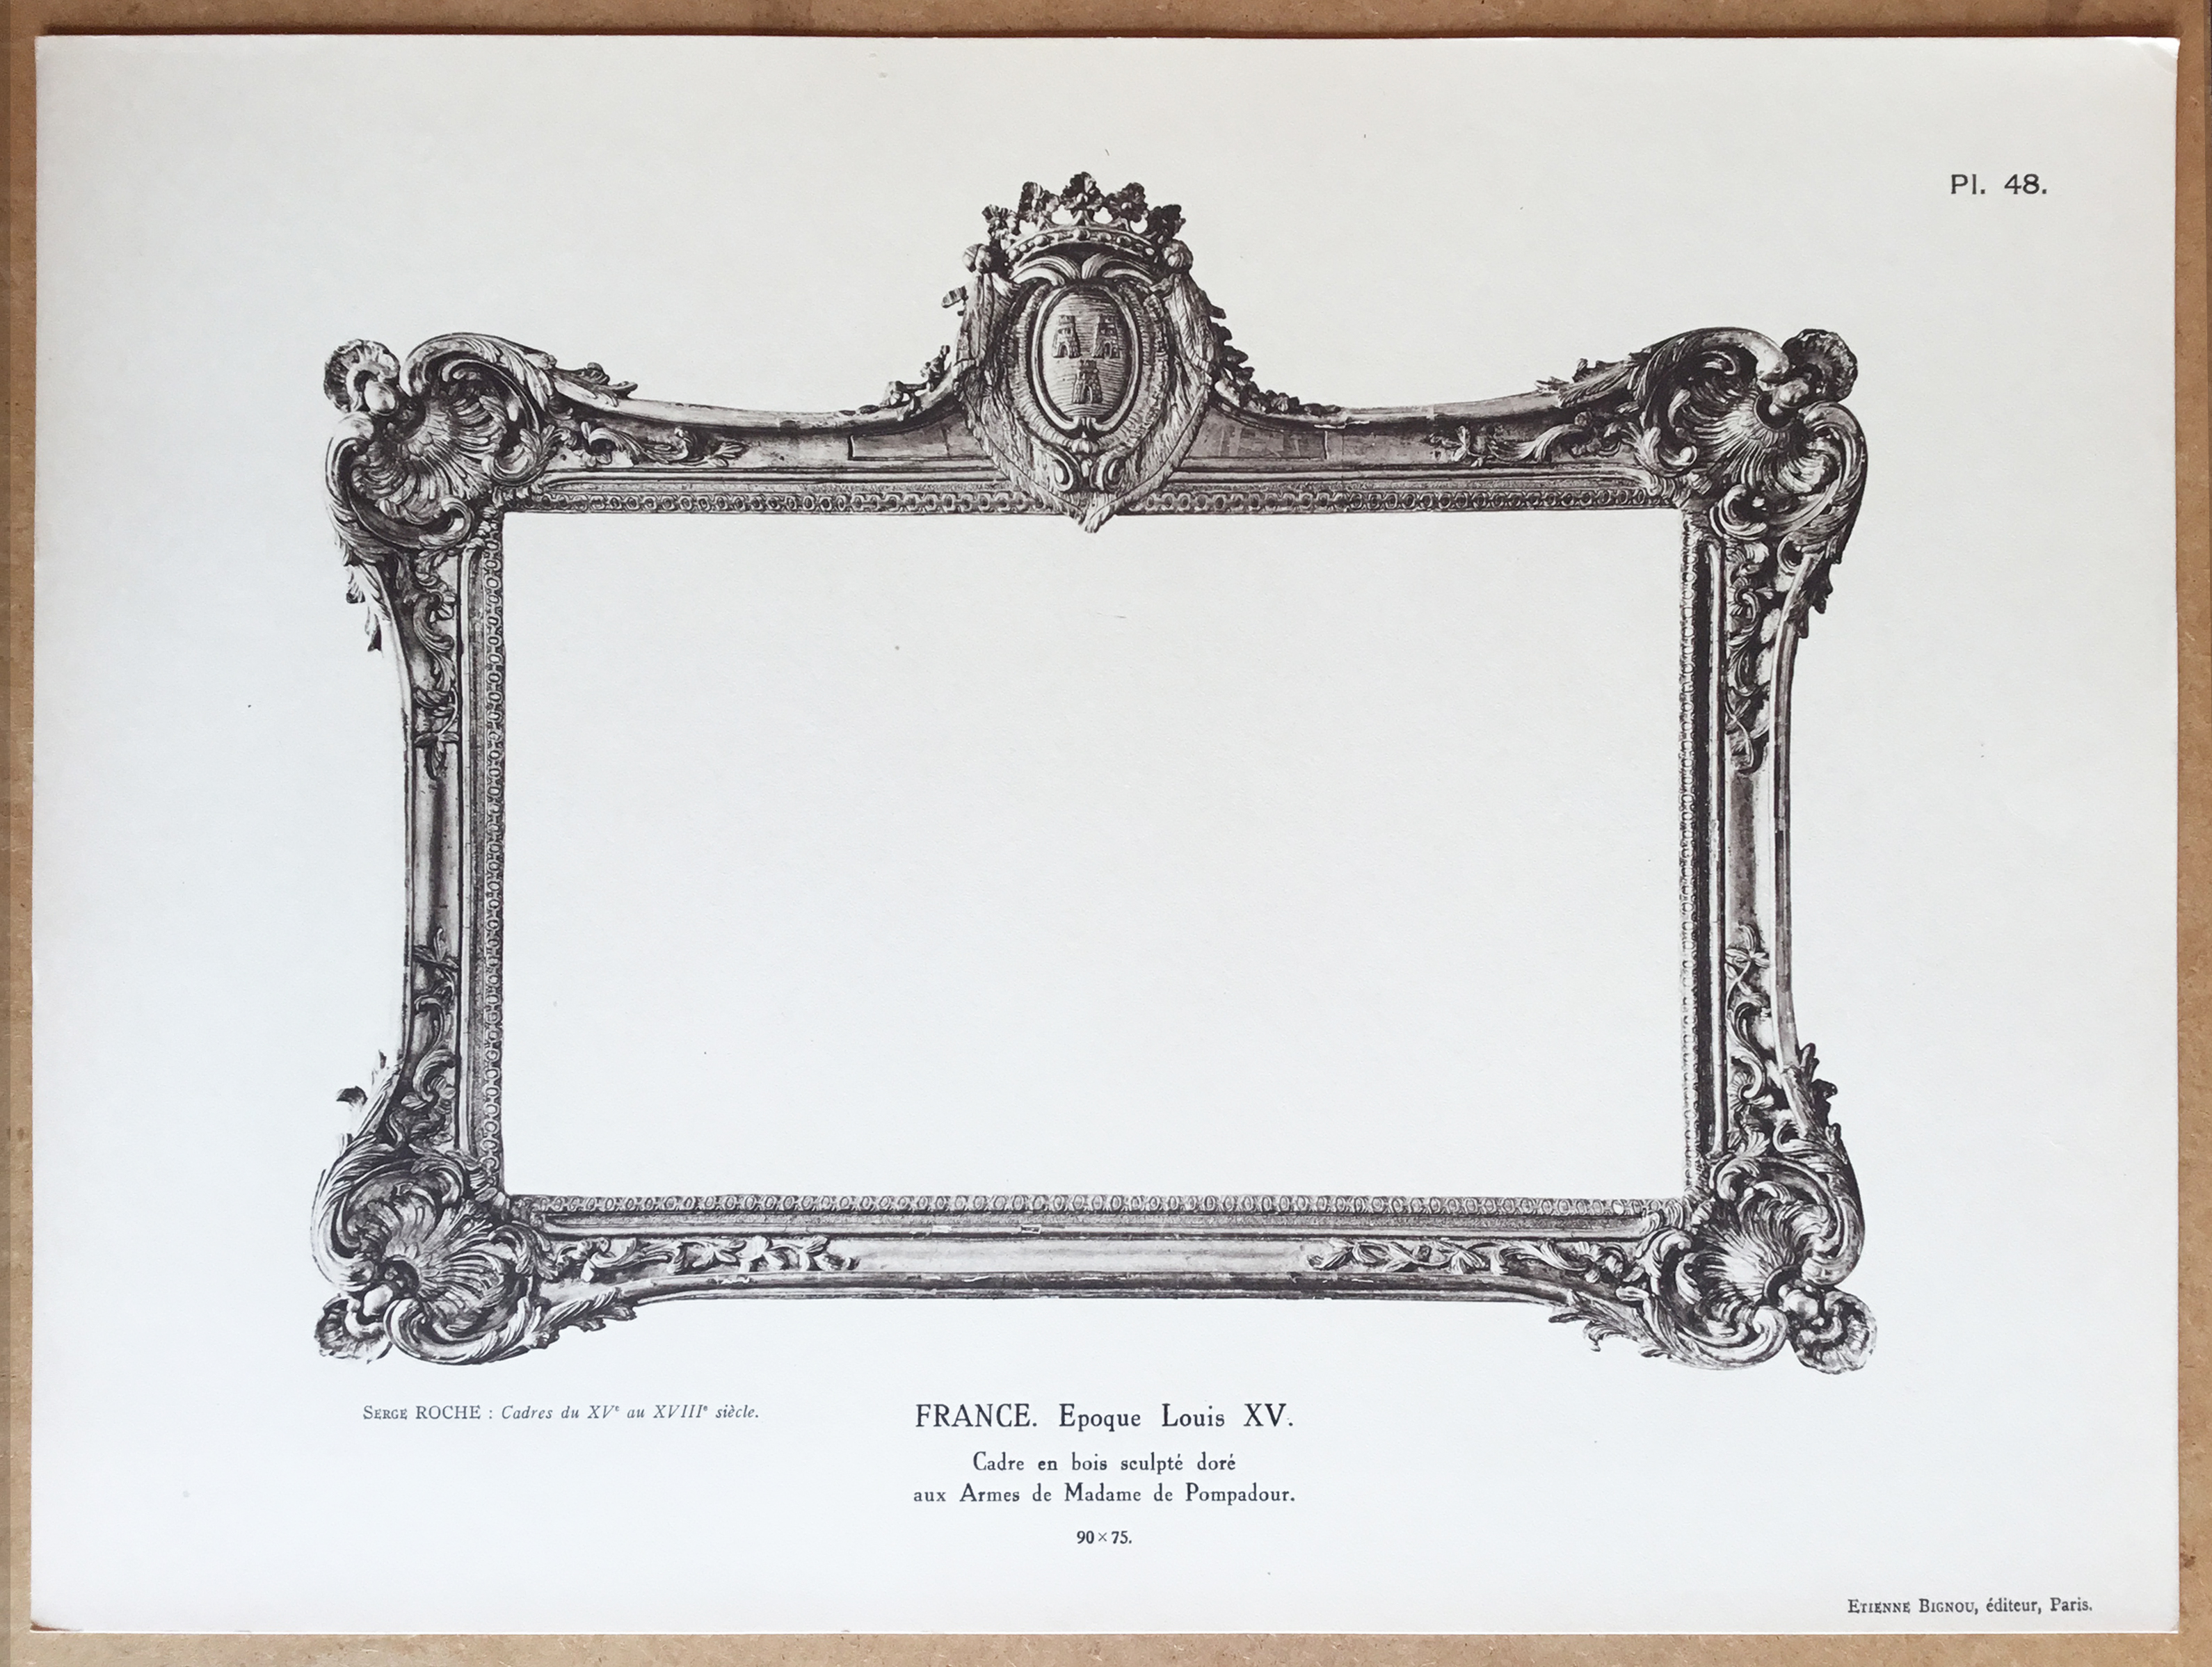 18 Plate 48